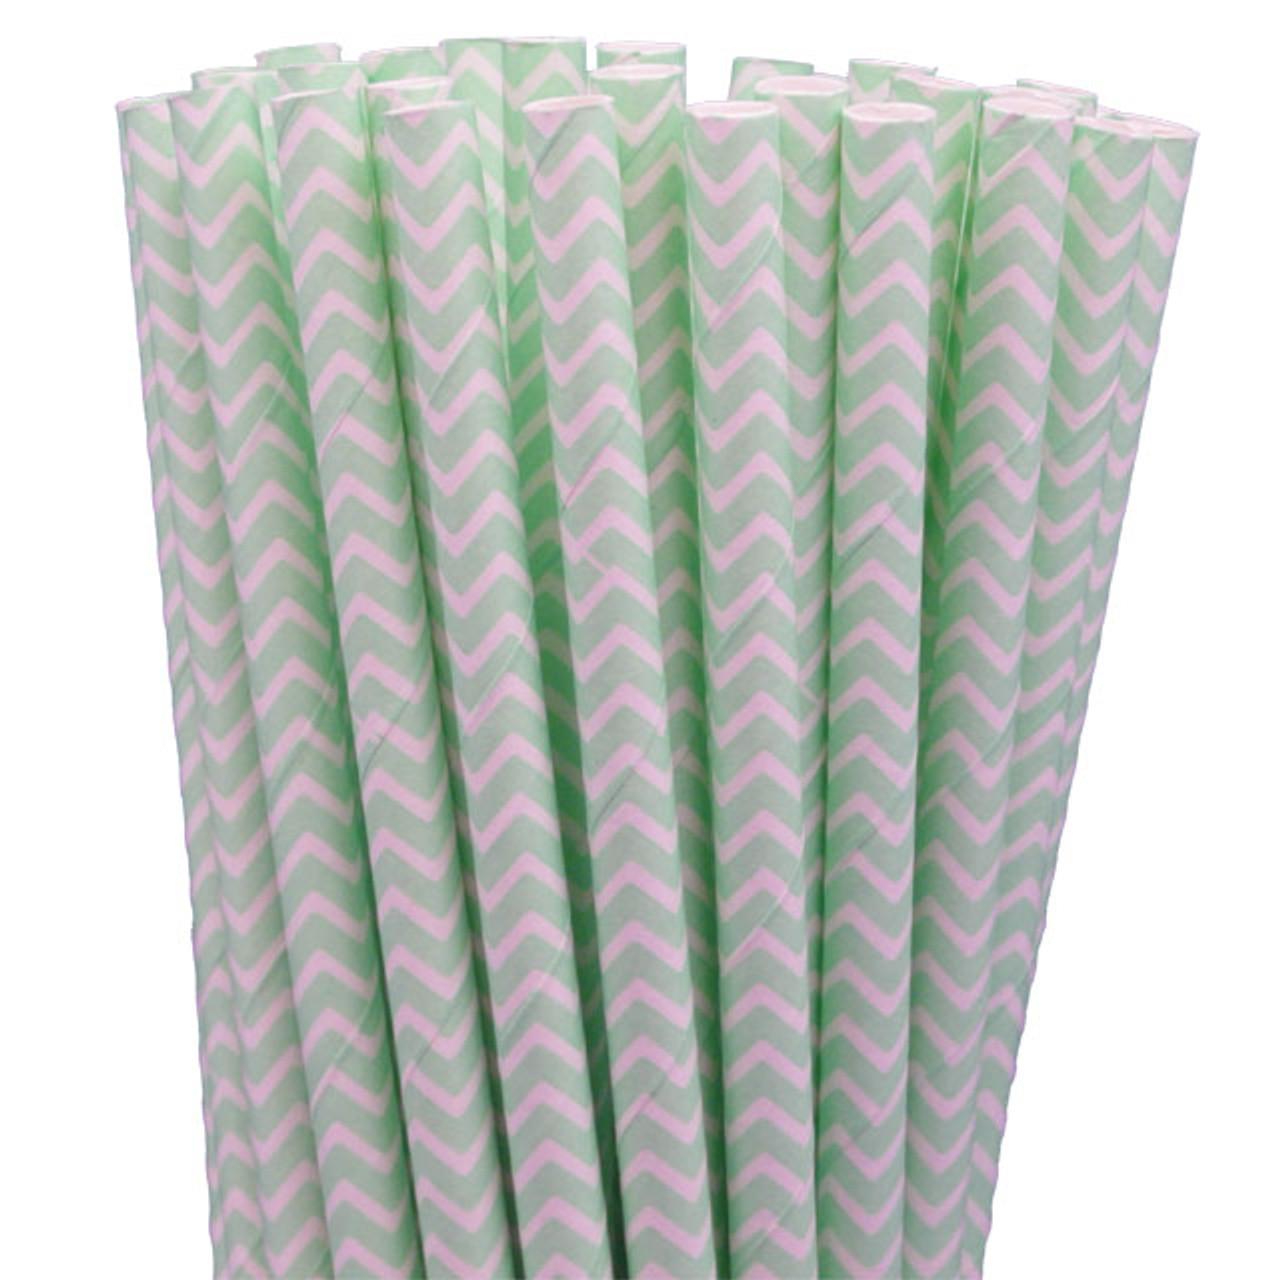 Paper Straws - Mint Green Chevron